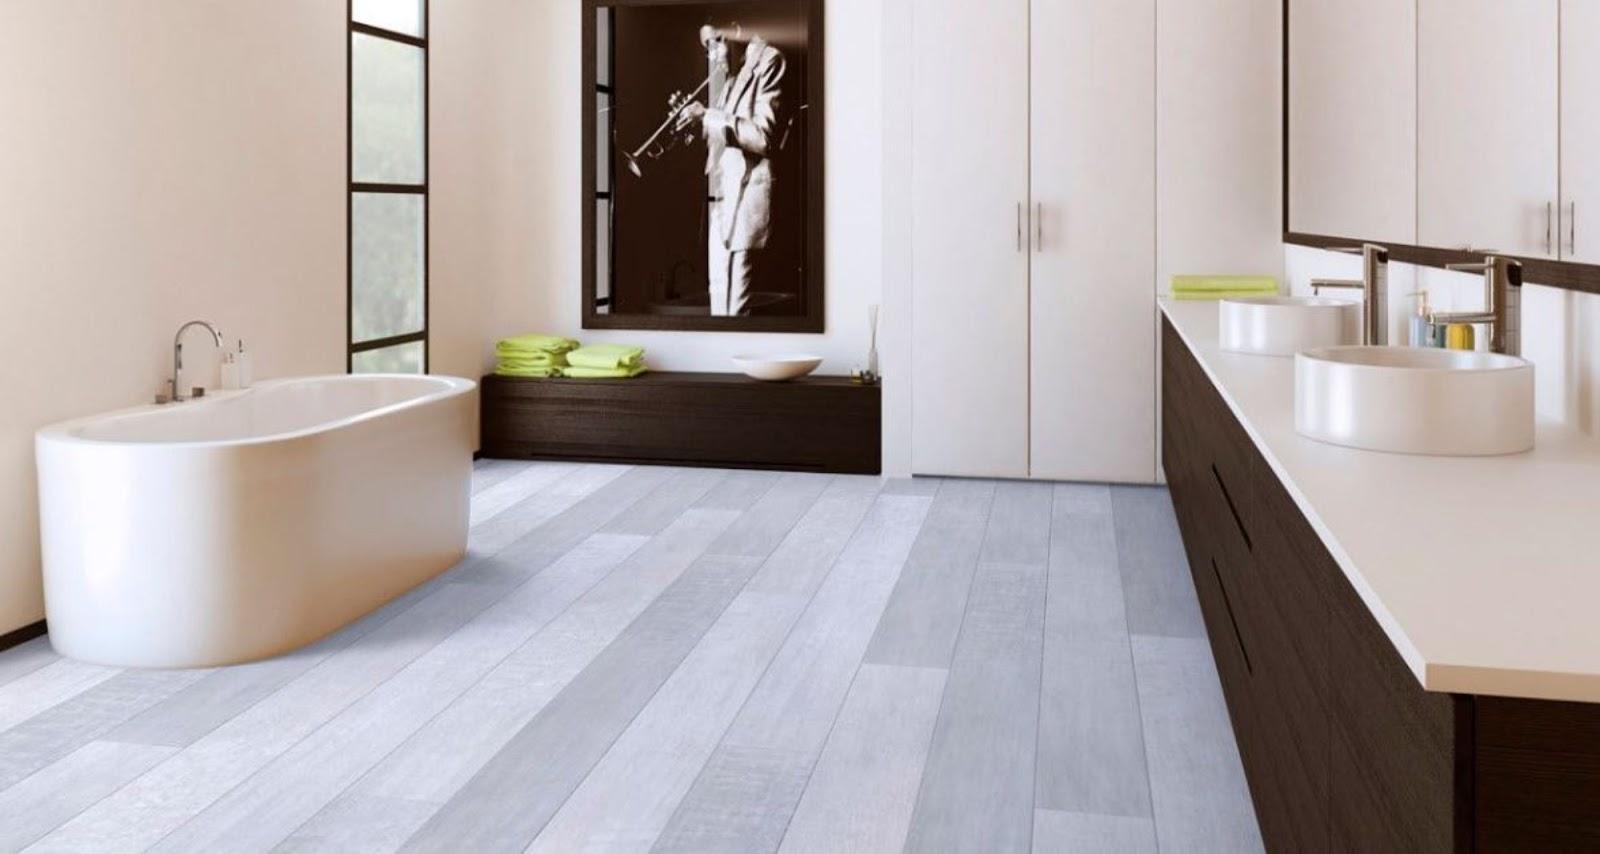 Modern Laminate Flooring trendy grey accents open space kitchen Modern Laminate Floor Design